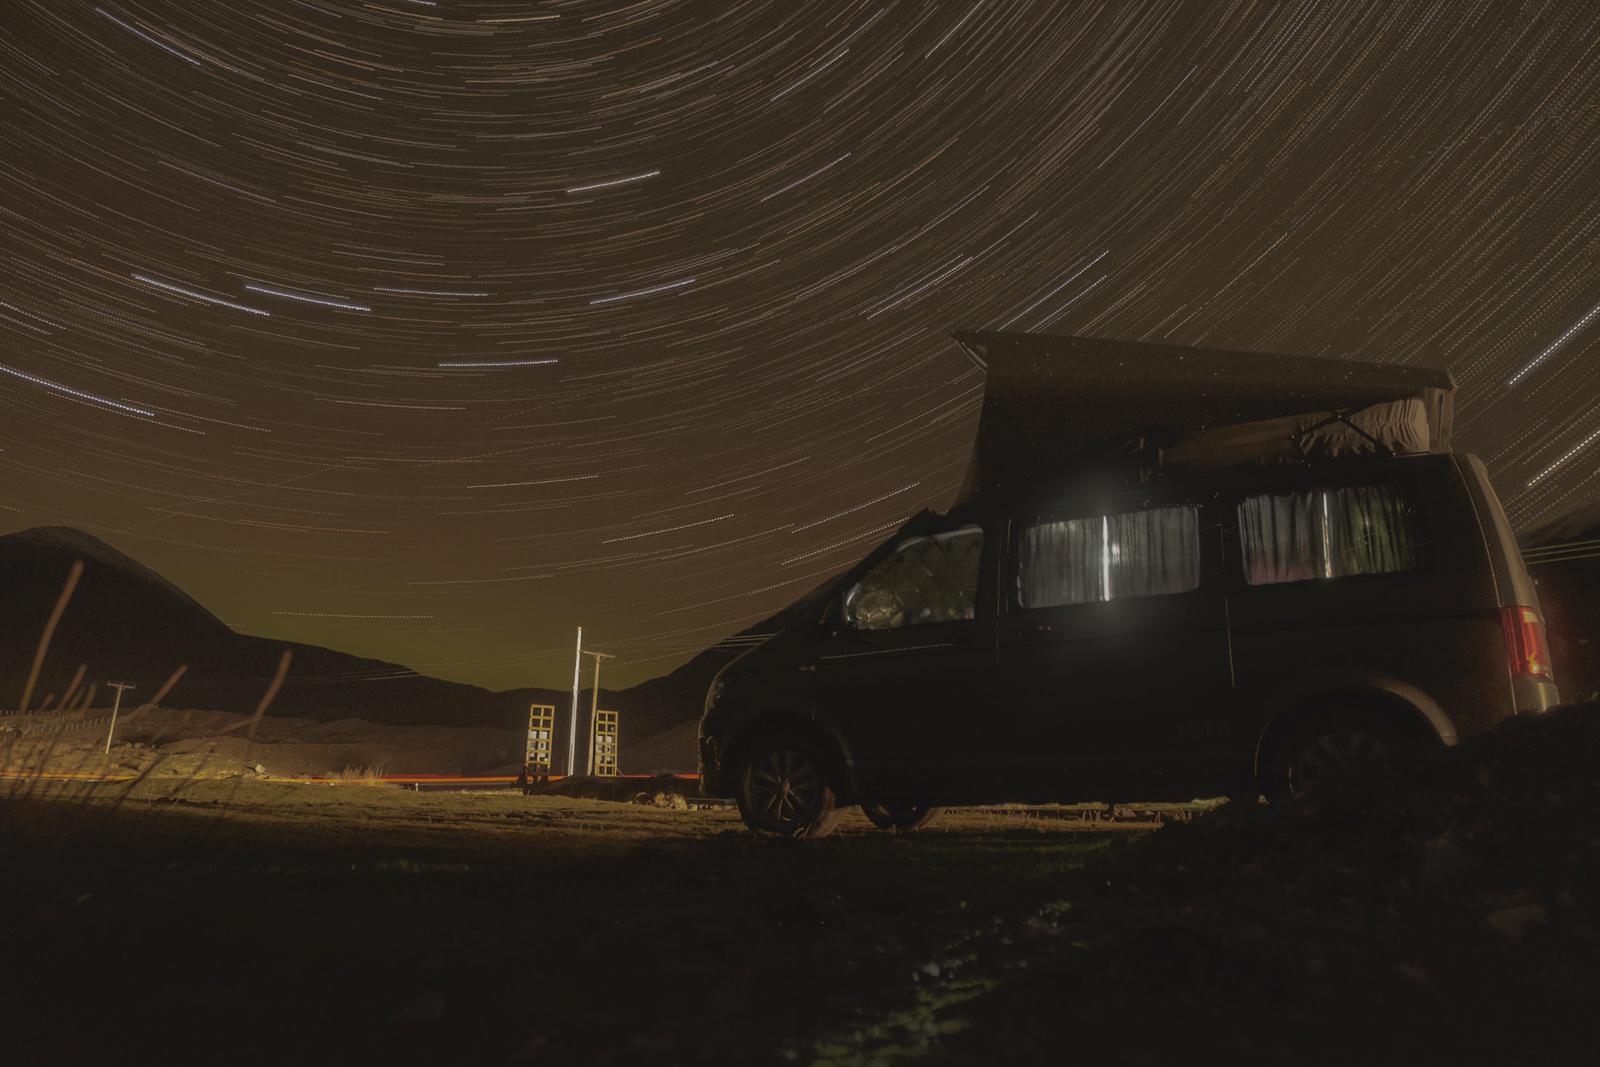 scottish highlands-1-2.jpg